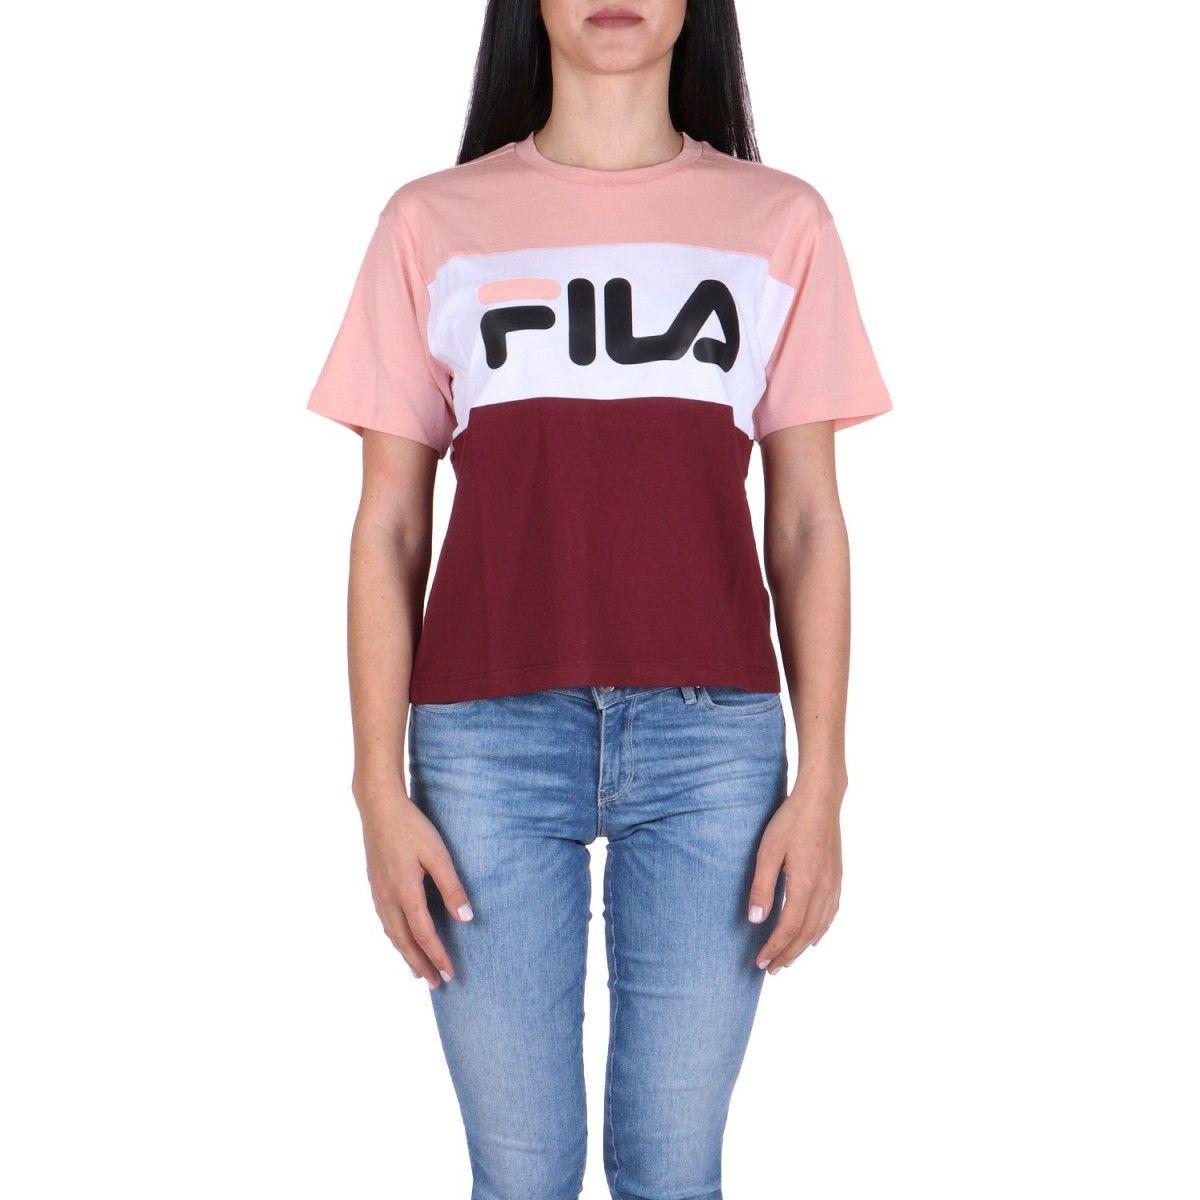 Fila T-shirt Rosa  682125